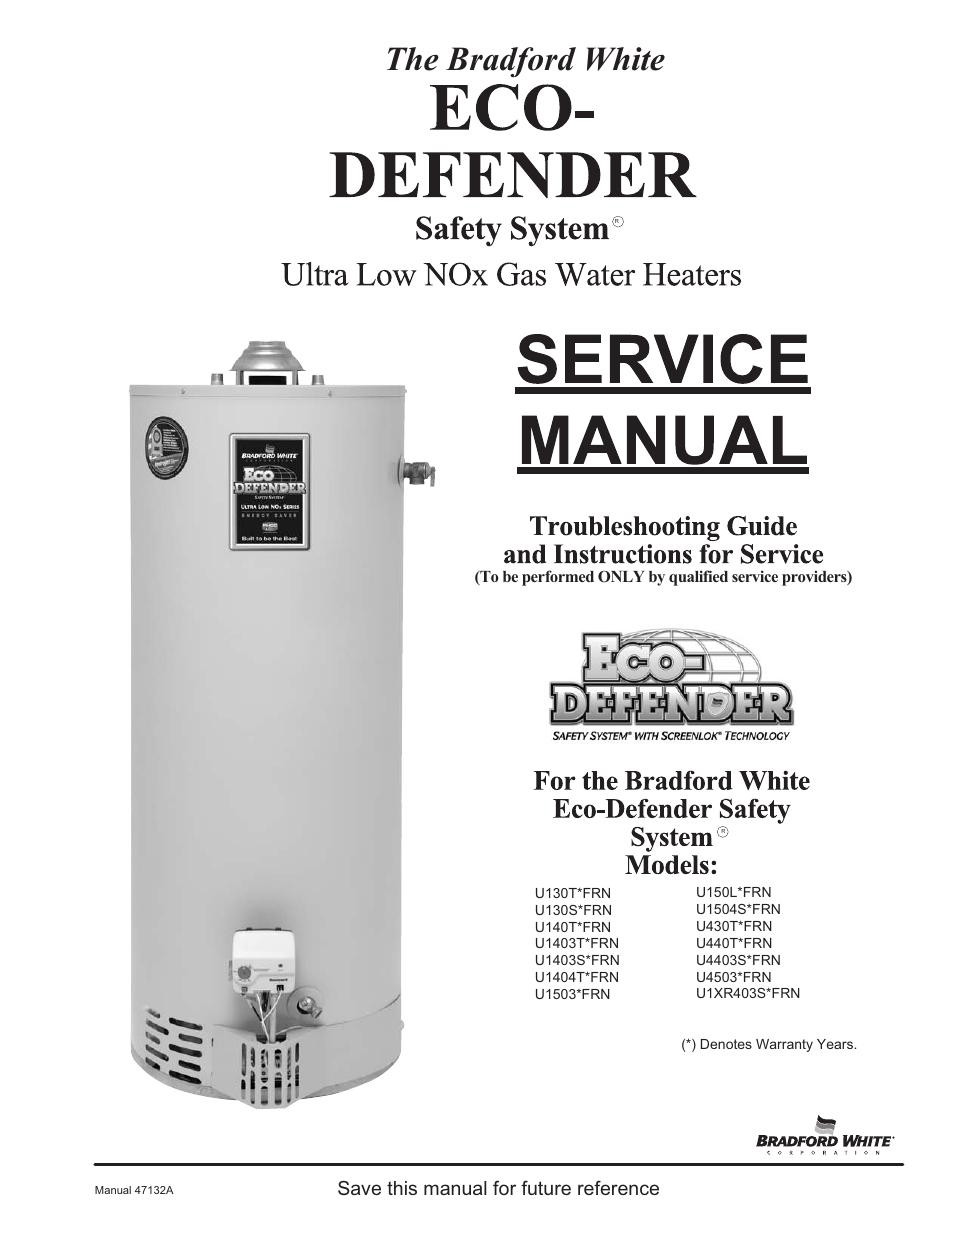 Bradford White U 65t 55fr 3n User Manual 28 Pages Also For Water Heater Wiring Diagram 50t U2 Xr 65t6frn 75s6rn 504t6frn U1 403s6frn U4 60t6frn